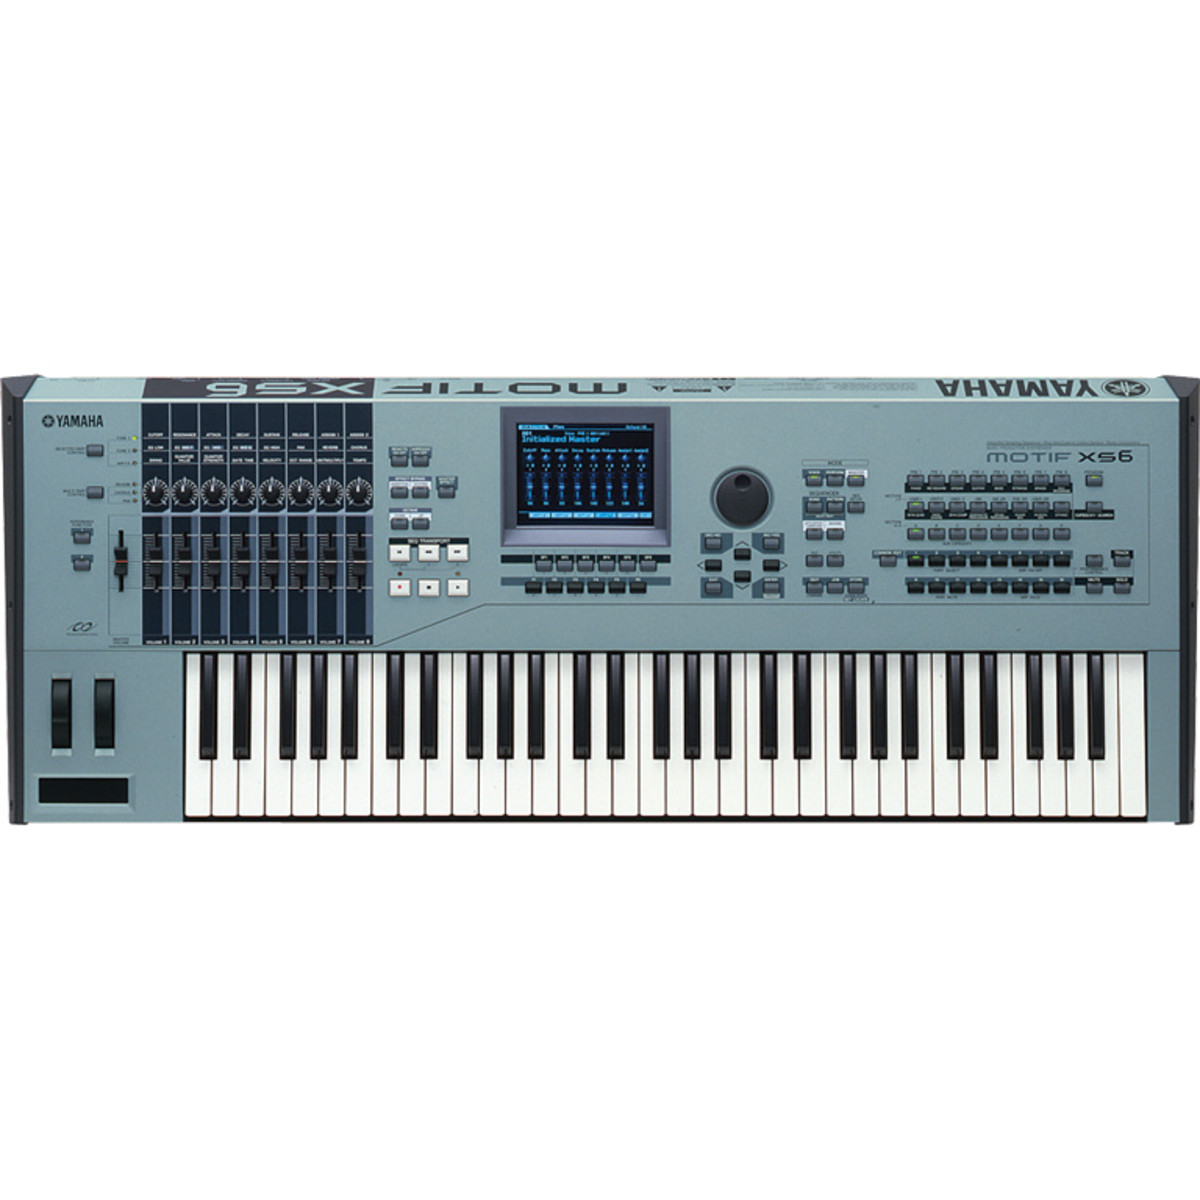 Yamaha MOTIF XS6 Keyboard Workstation (Used)